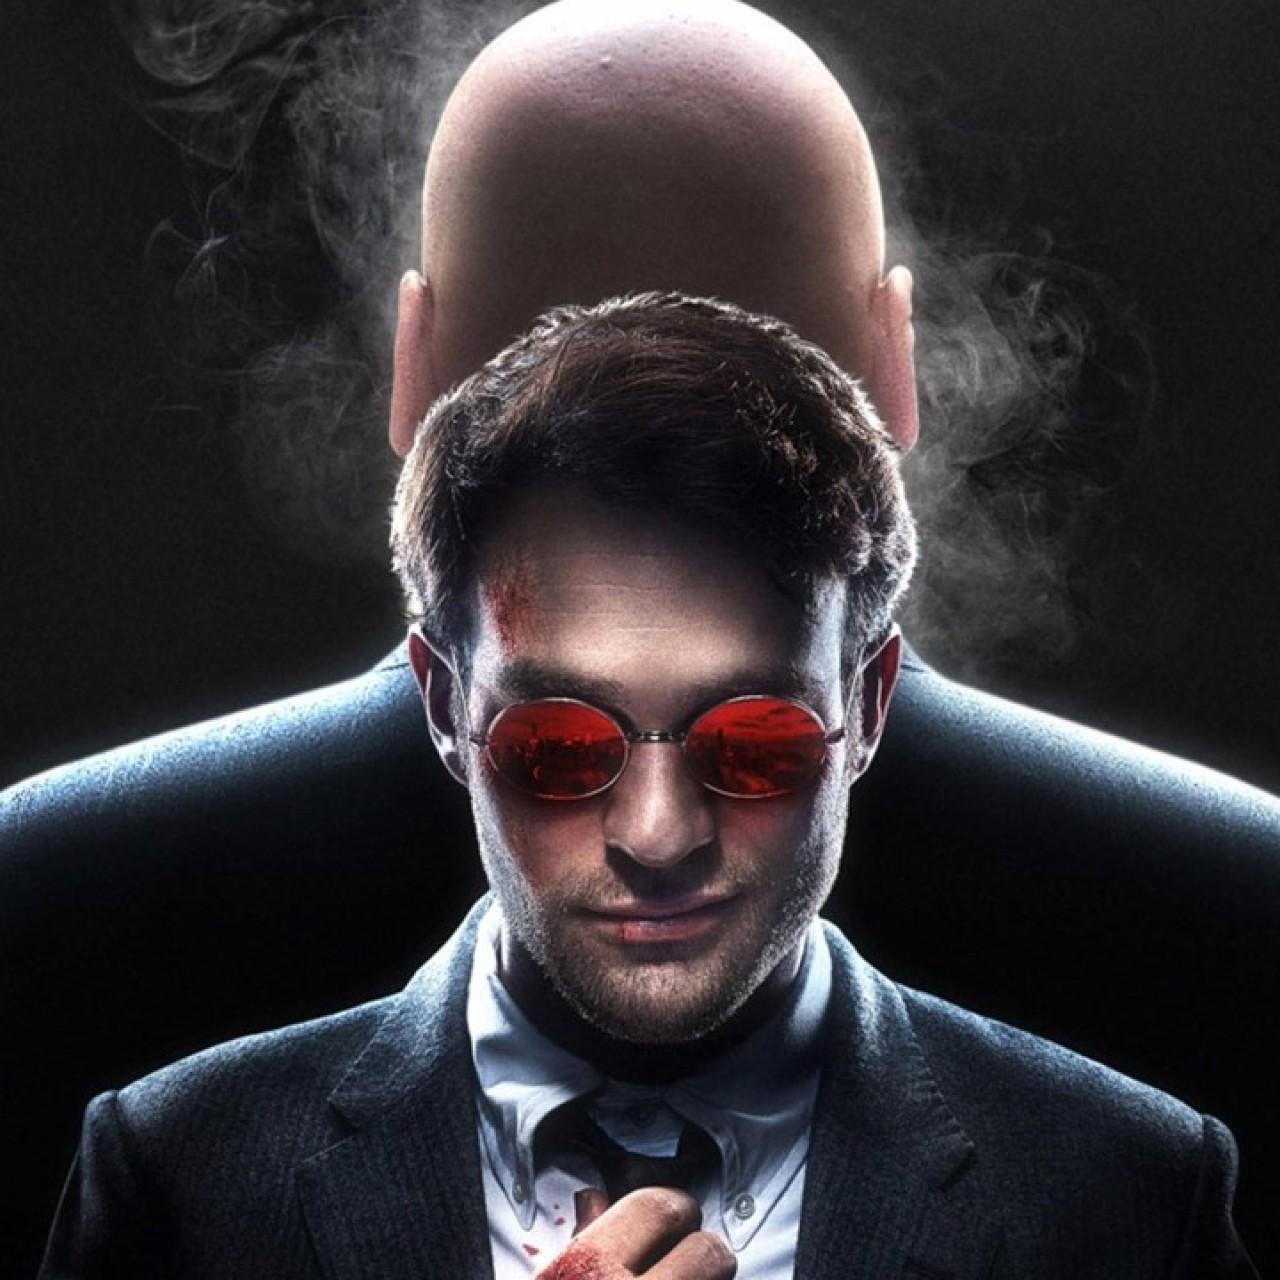 Kingpin, the ultimate villain in Netflix's Daredevil, and